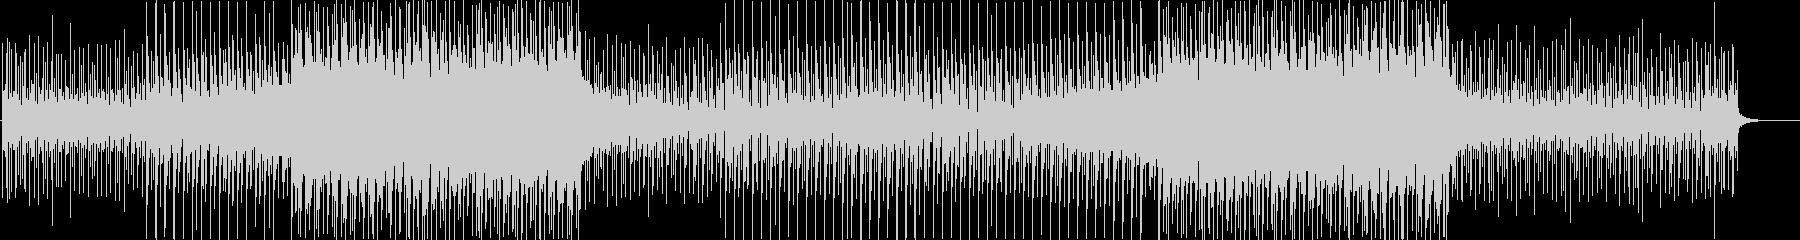 Tropical House 5の未再生の波形